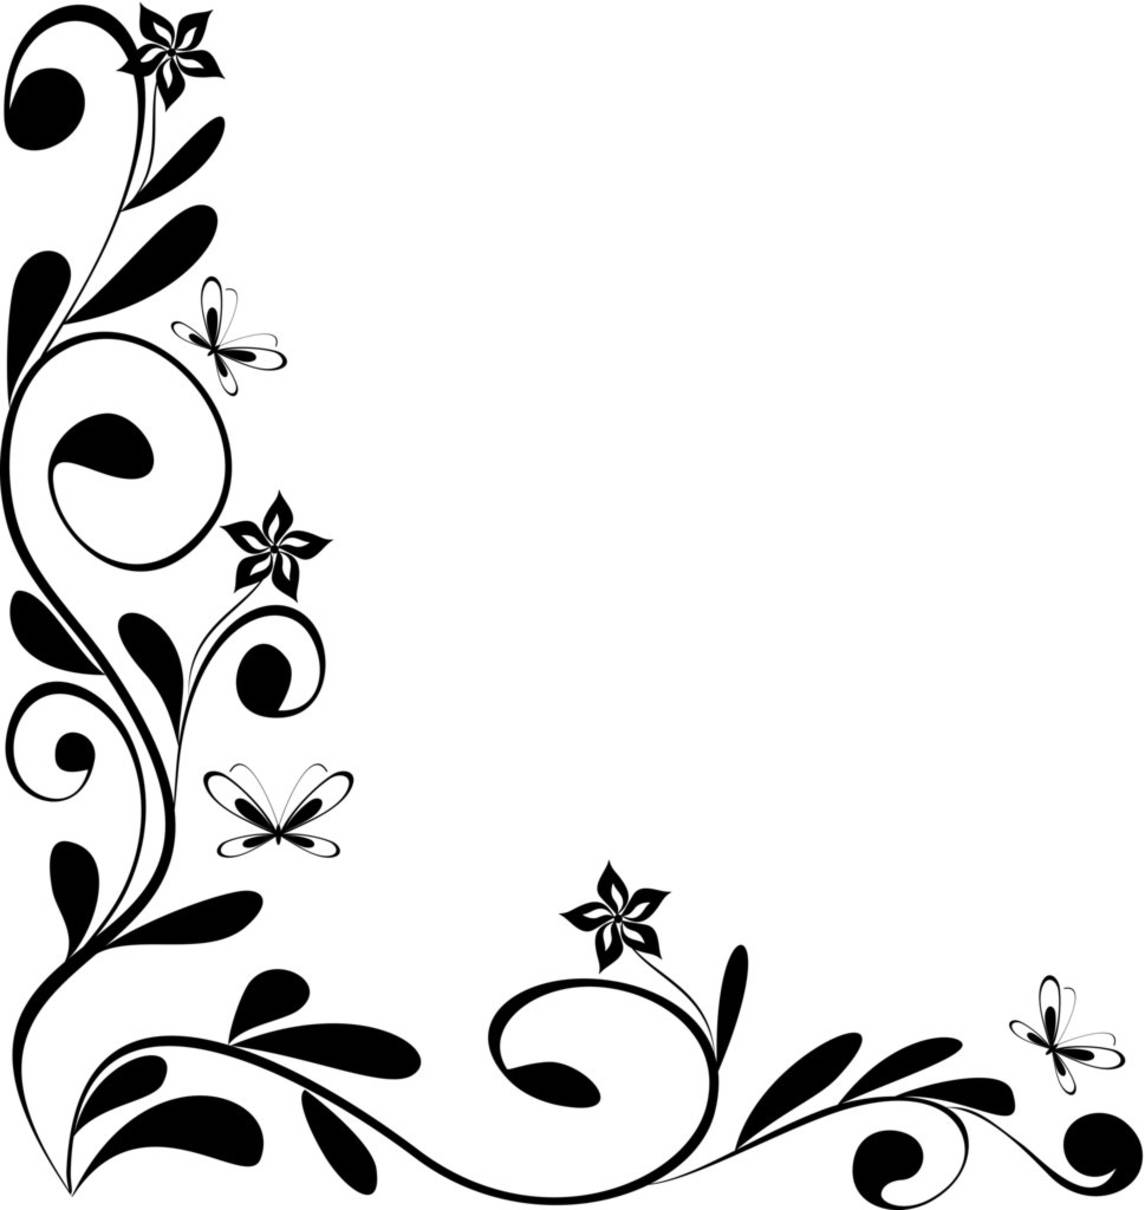 Black and White Flowers Corner Border Designs